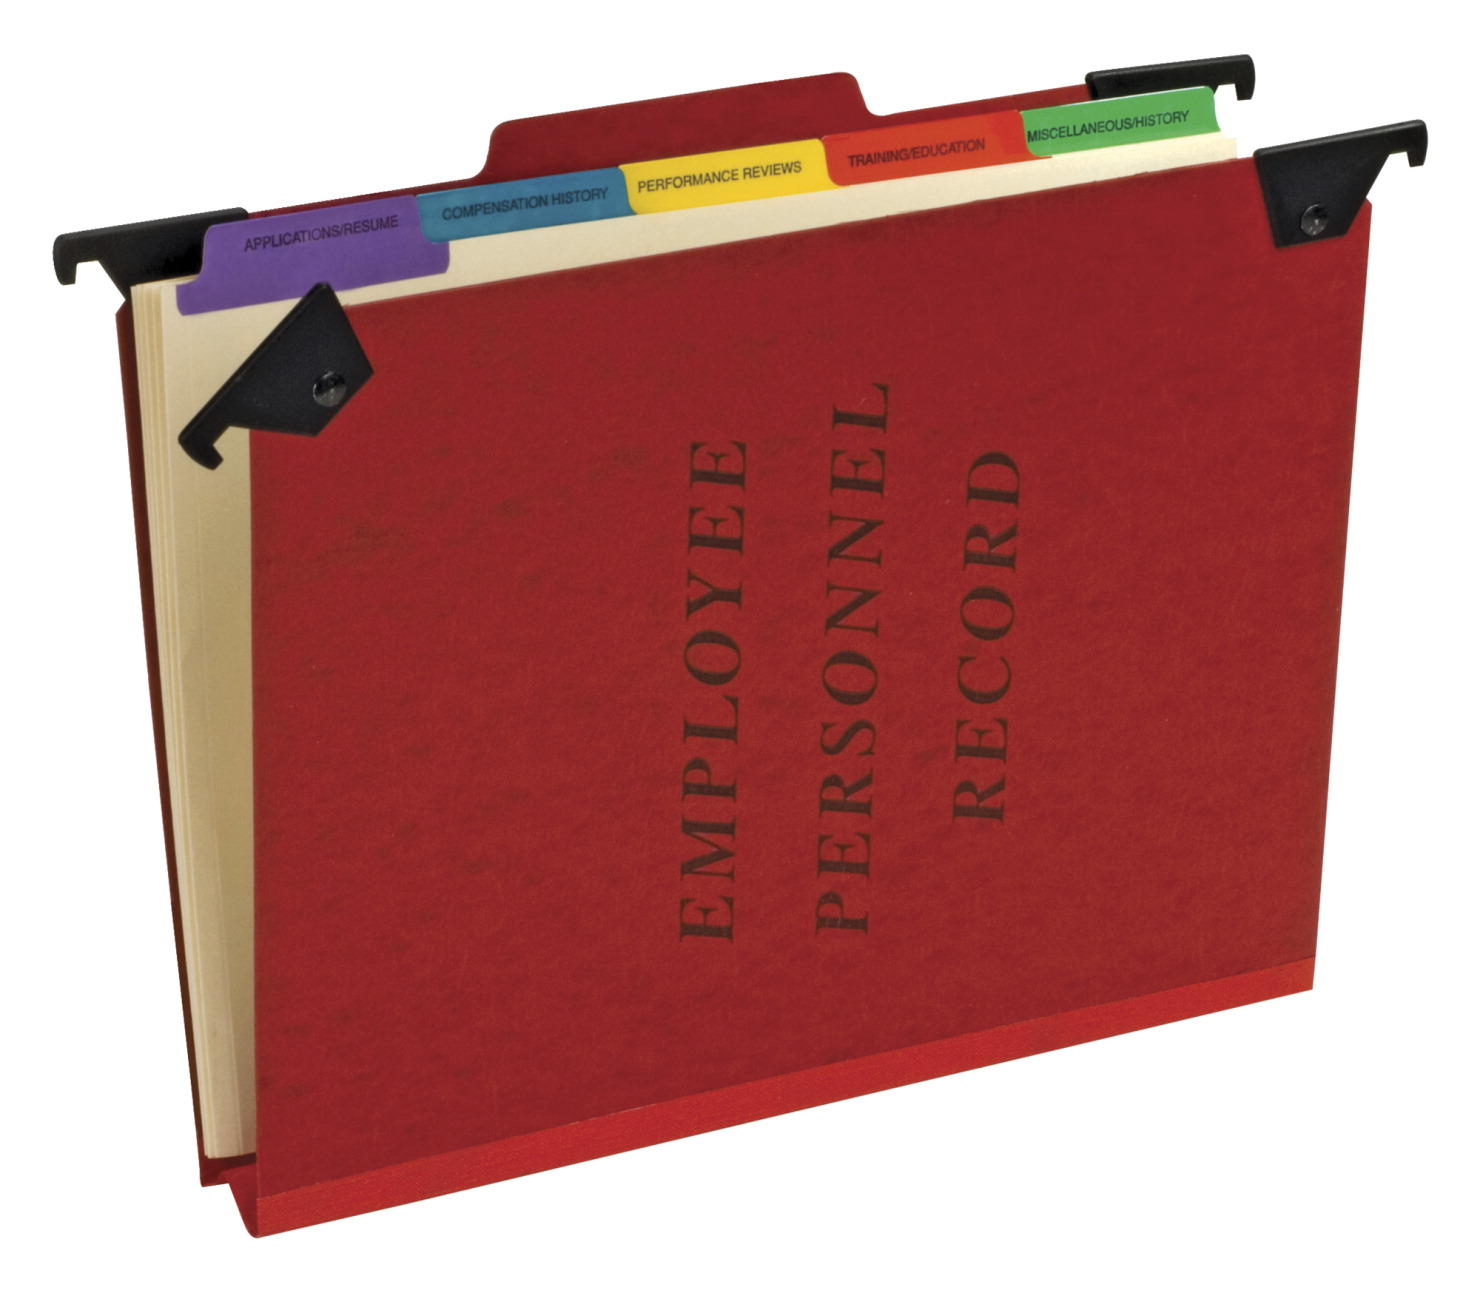 Pendaflex Hanging Folder, Red